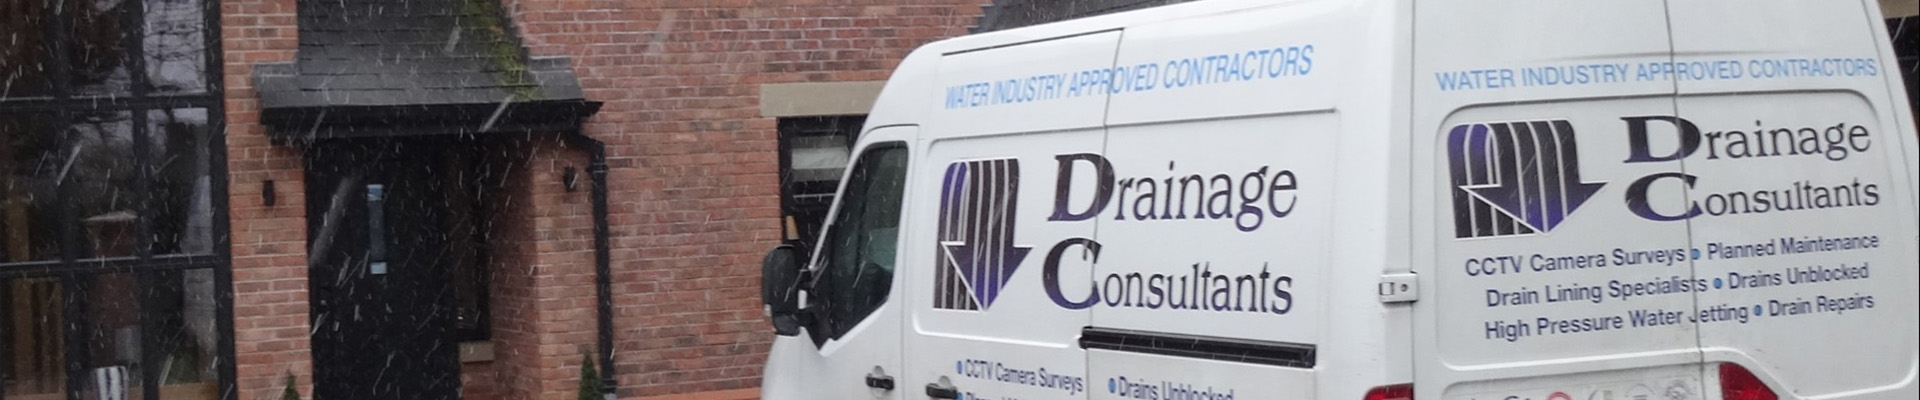 Drainage Consultants